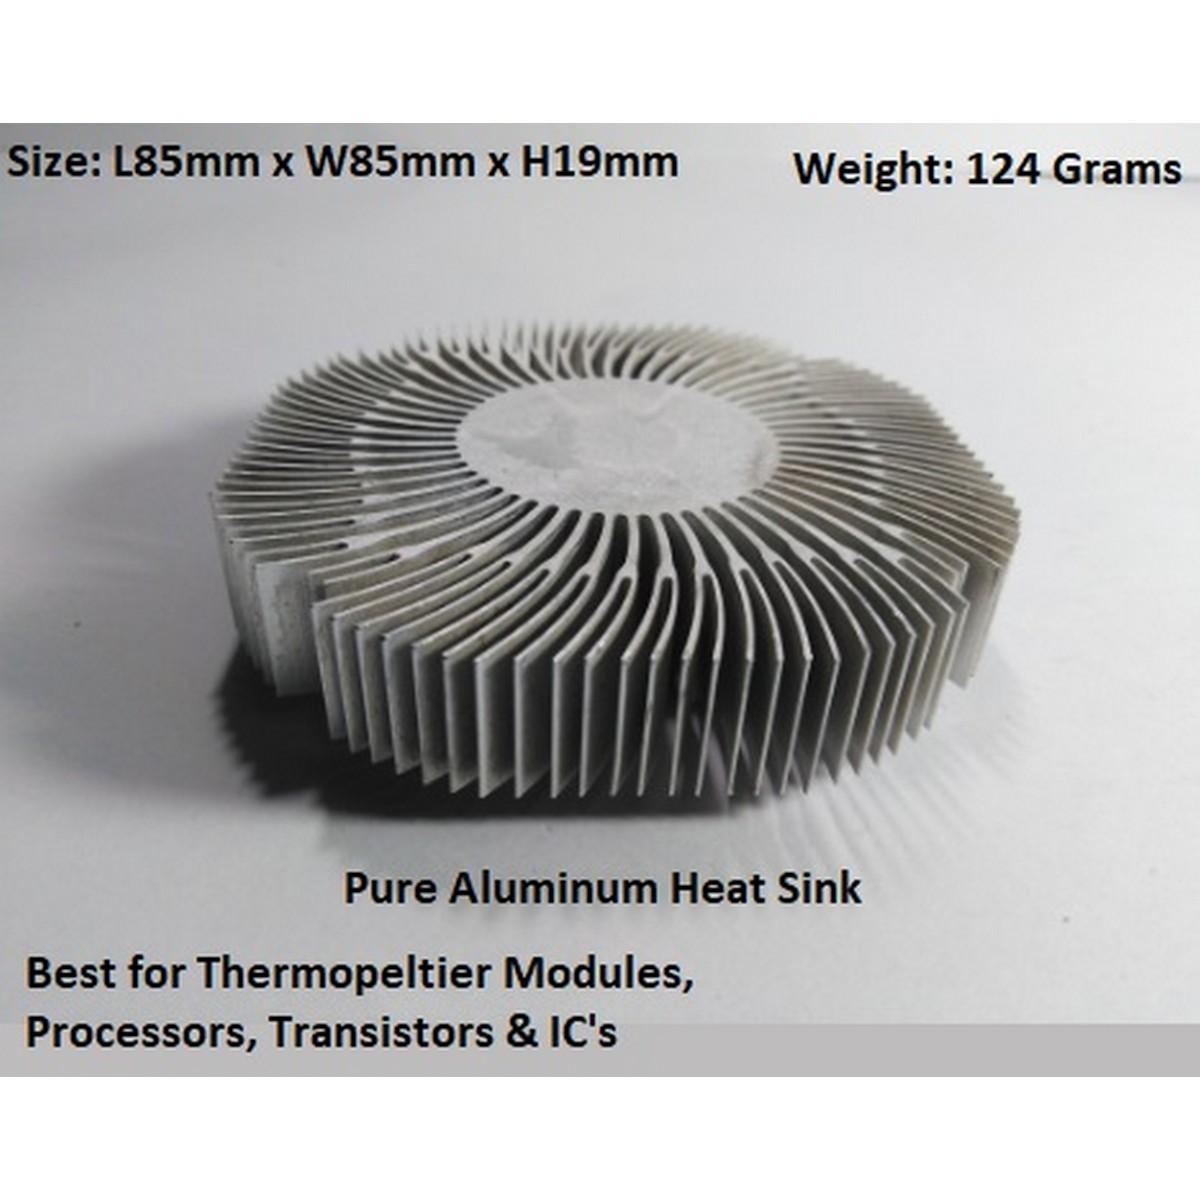 High Quality Large Pure Aluminum Heat Sink Cooler Cooling fin - Heatsink for Peltier, IC, LED's Transistor, RAM - Size: L85mm x W85mm x H19mm